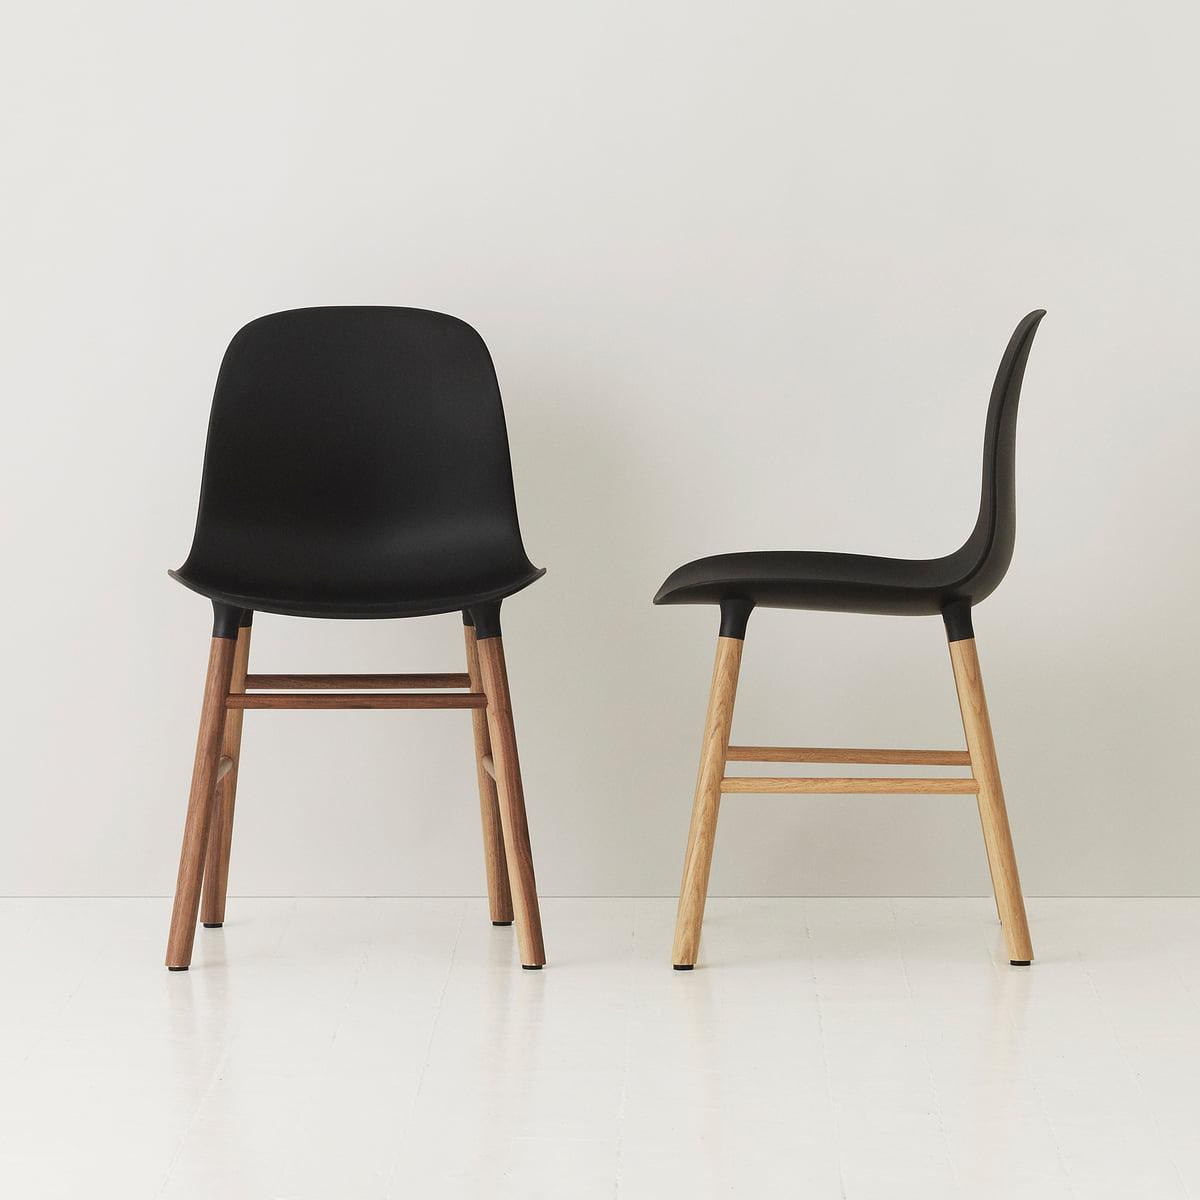 form chair holz von normann copenhagen. Black Bedroom Furniture Sets. Home Design Ideas